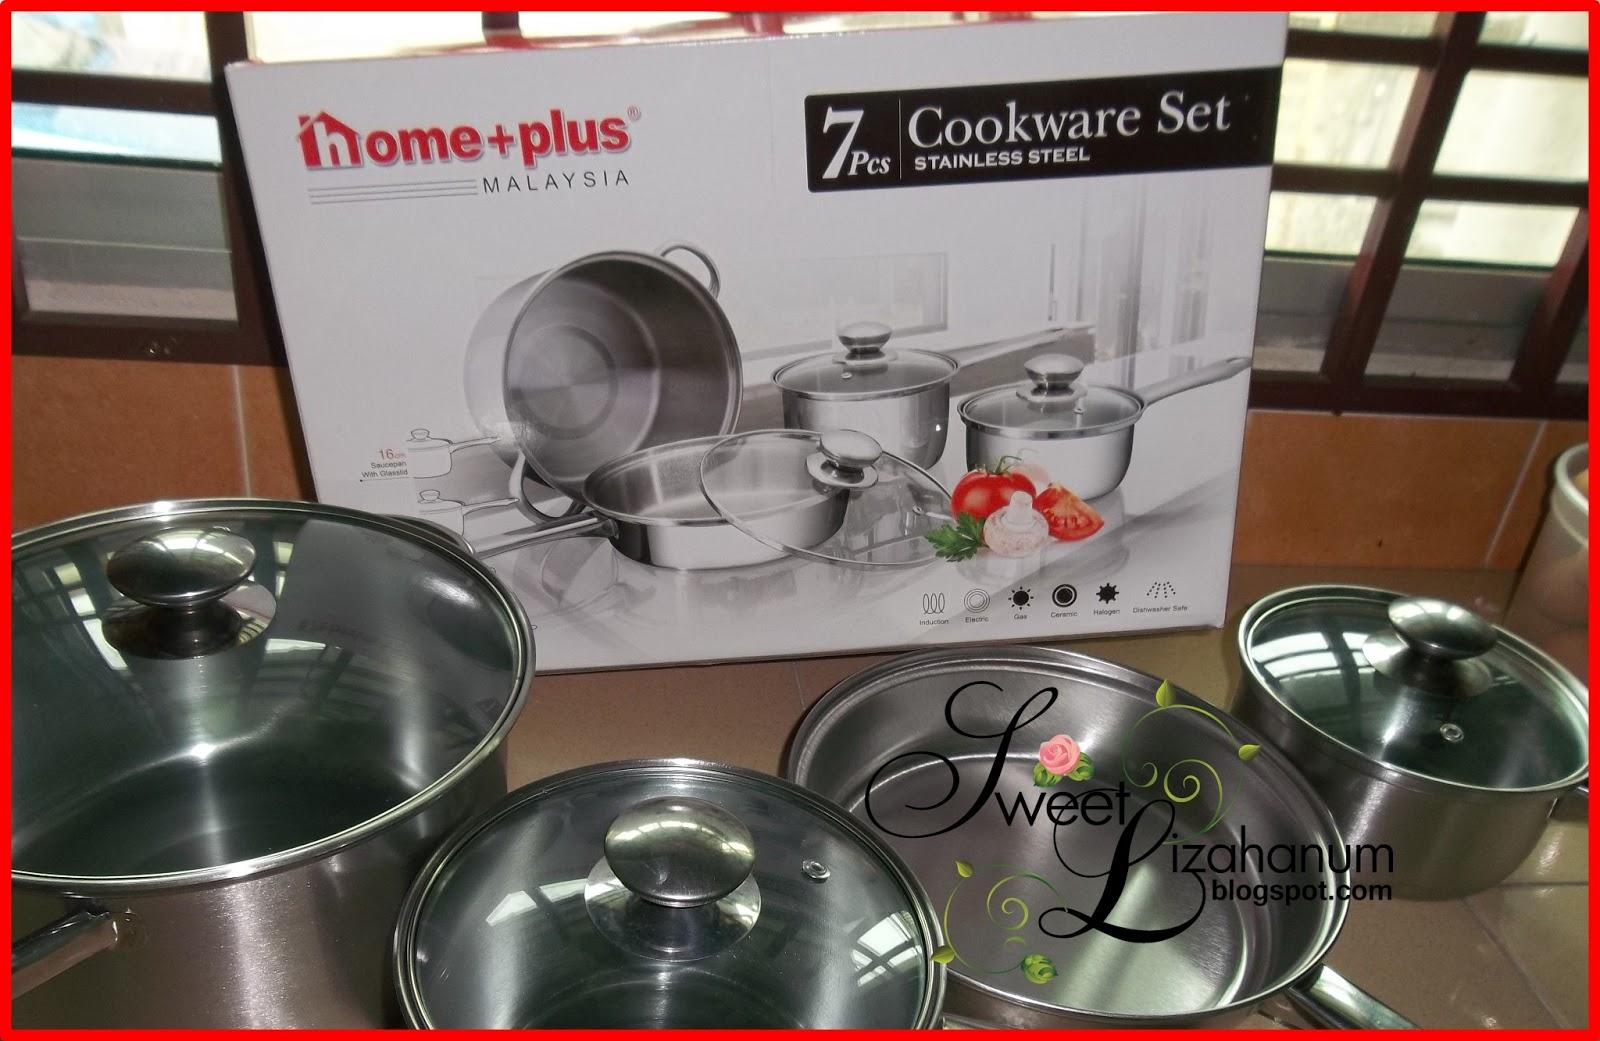 Terpaksa Beli Cookware Baru Yang Memang Khas Untuk Induction Cooker Periuk Belanga Dapur Gas Punya Akan Di Sedekahkan Pada Sape2 Nanti